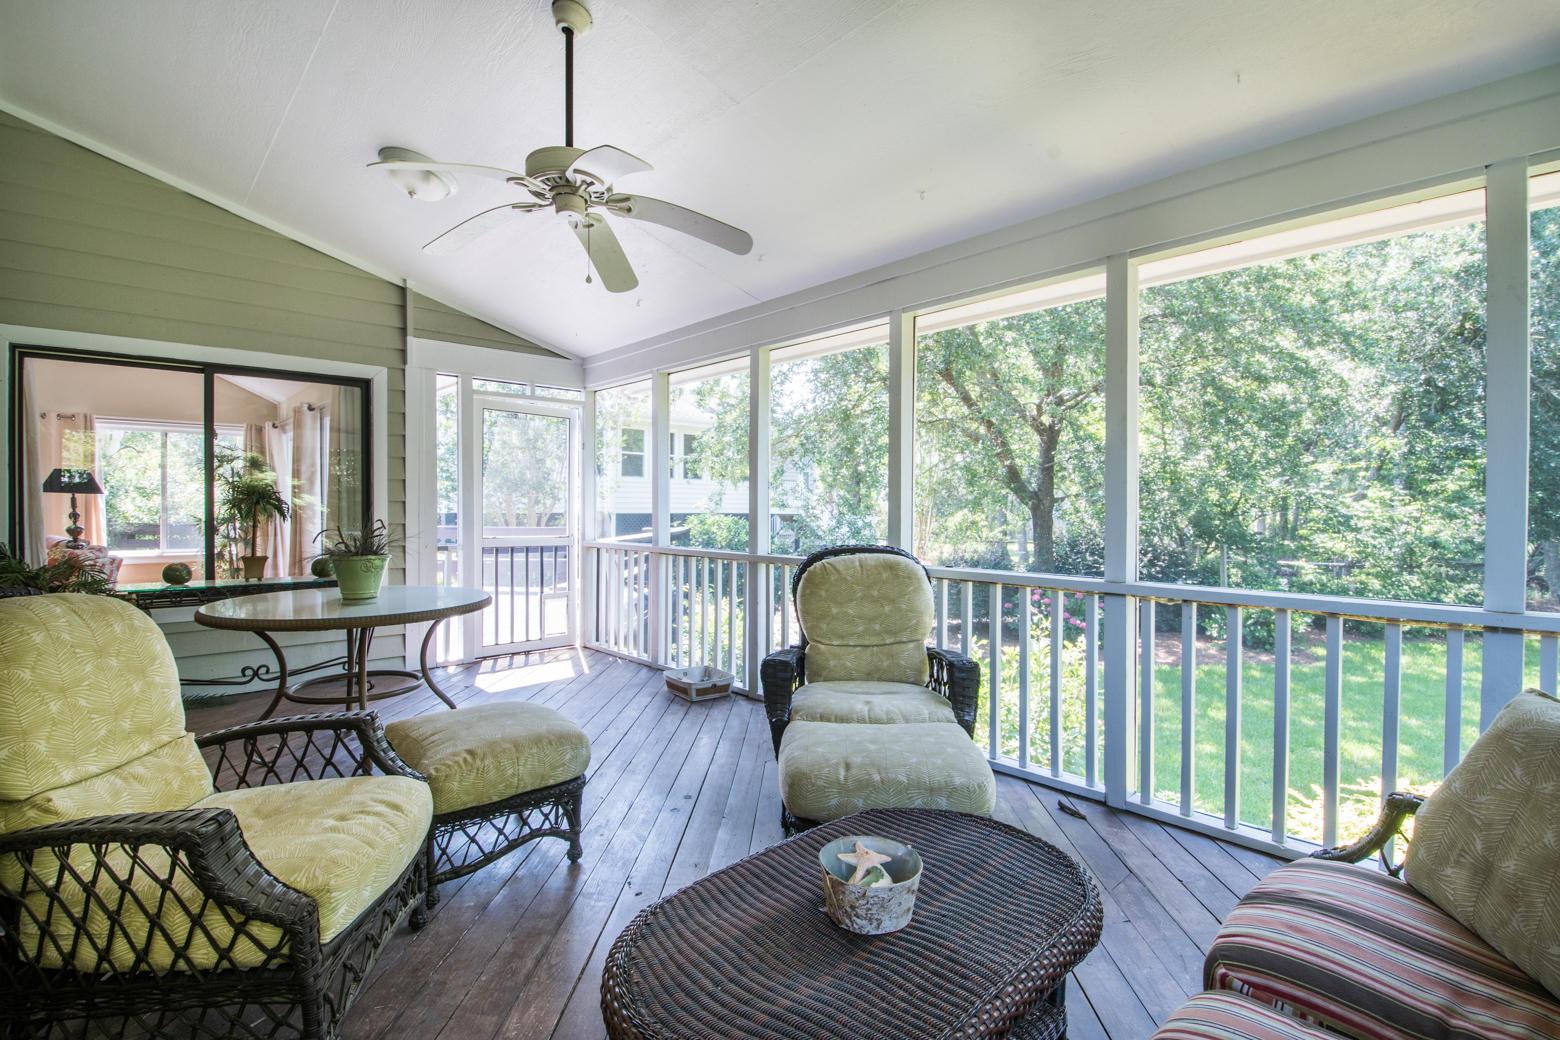 Wakendaw On The Creek Homes For Sale - 664 Oak Marsh, Mount Pleasant, SC - 29